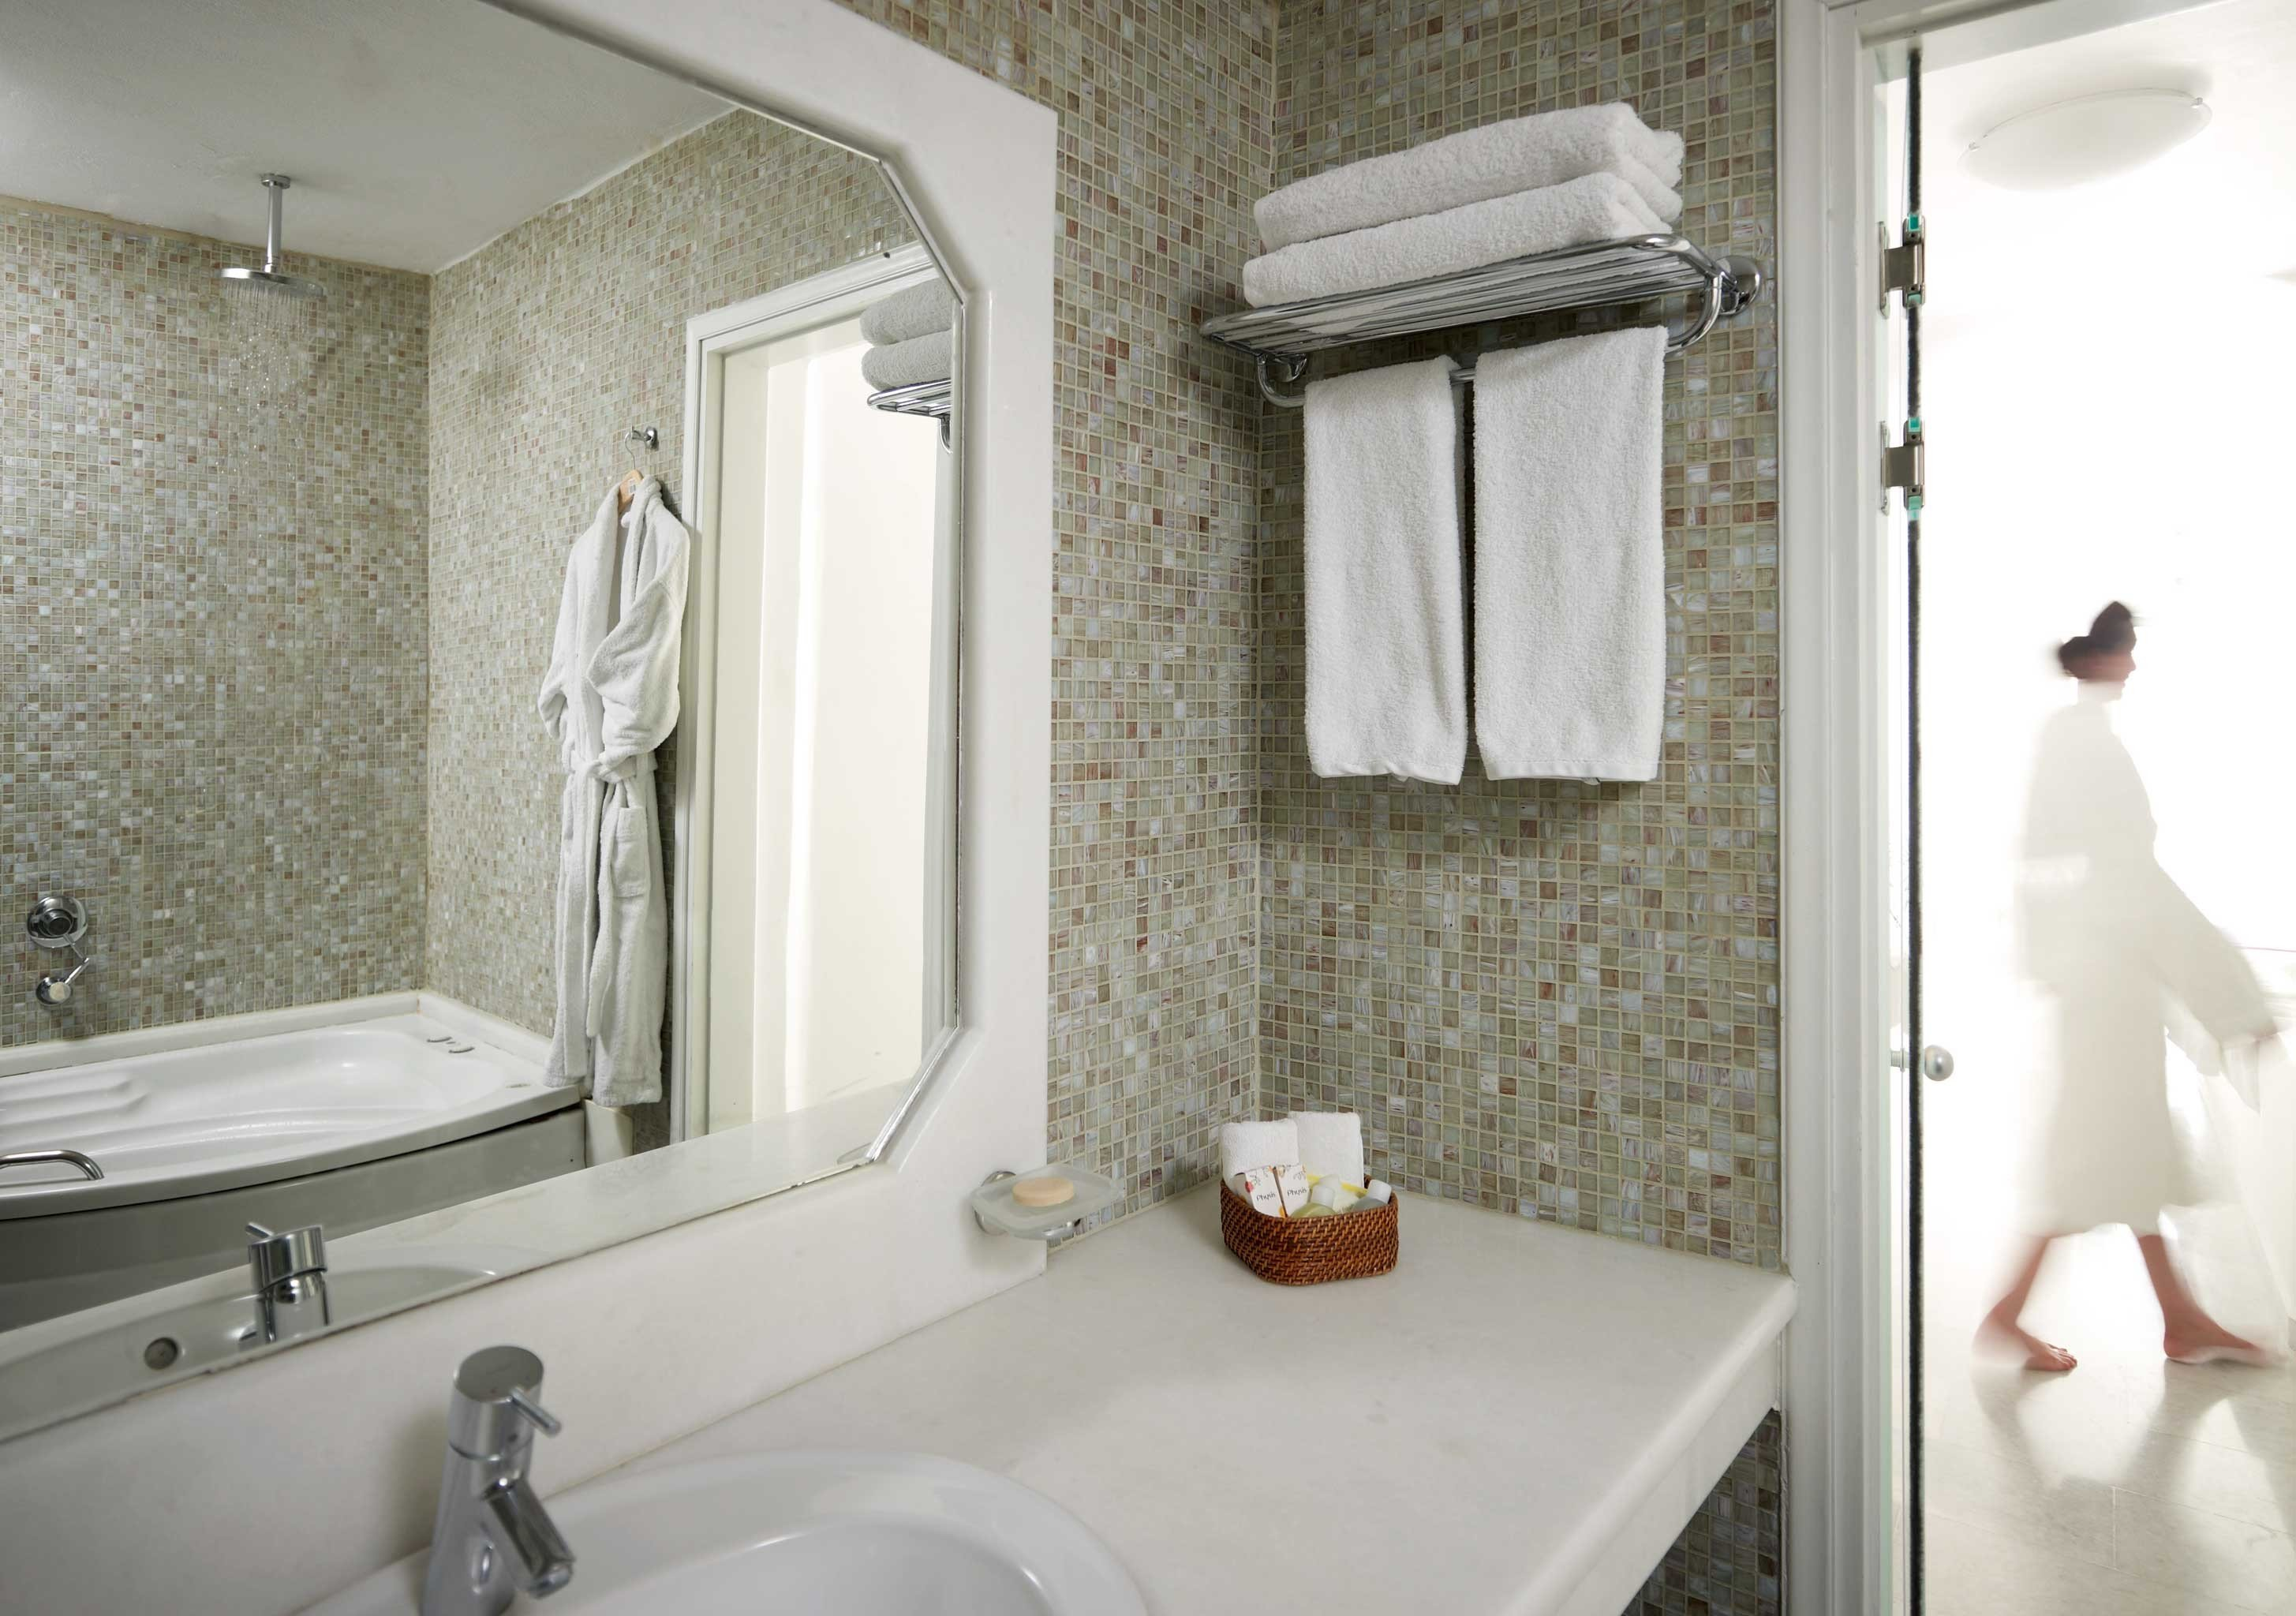 bathroom sink property mirror toilet home white cottage Suite plumbing fixture Bath